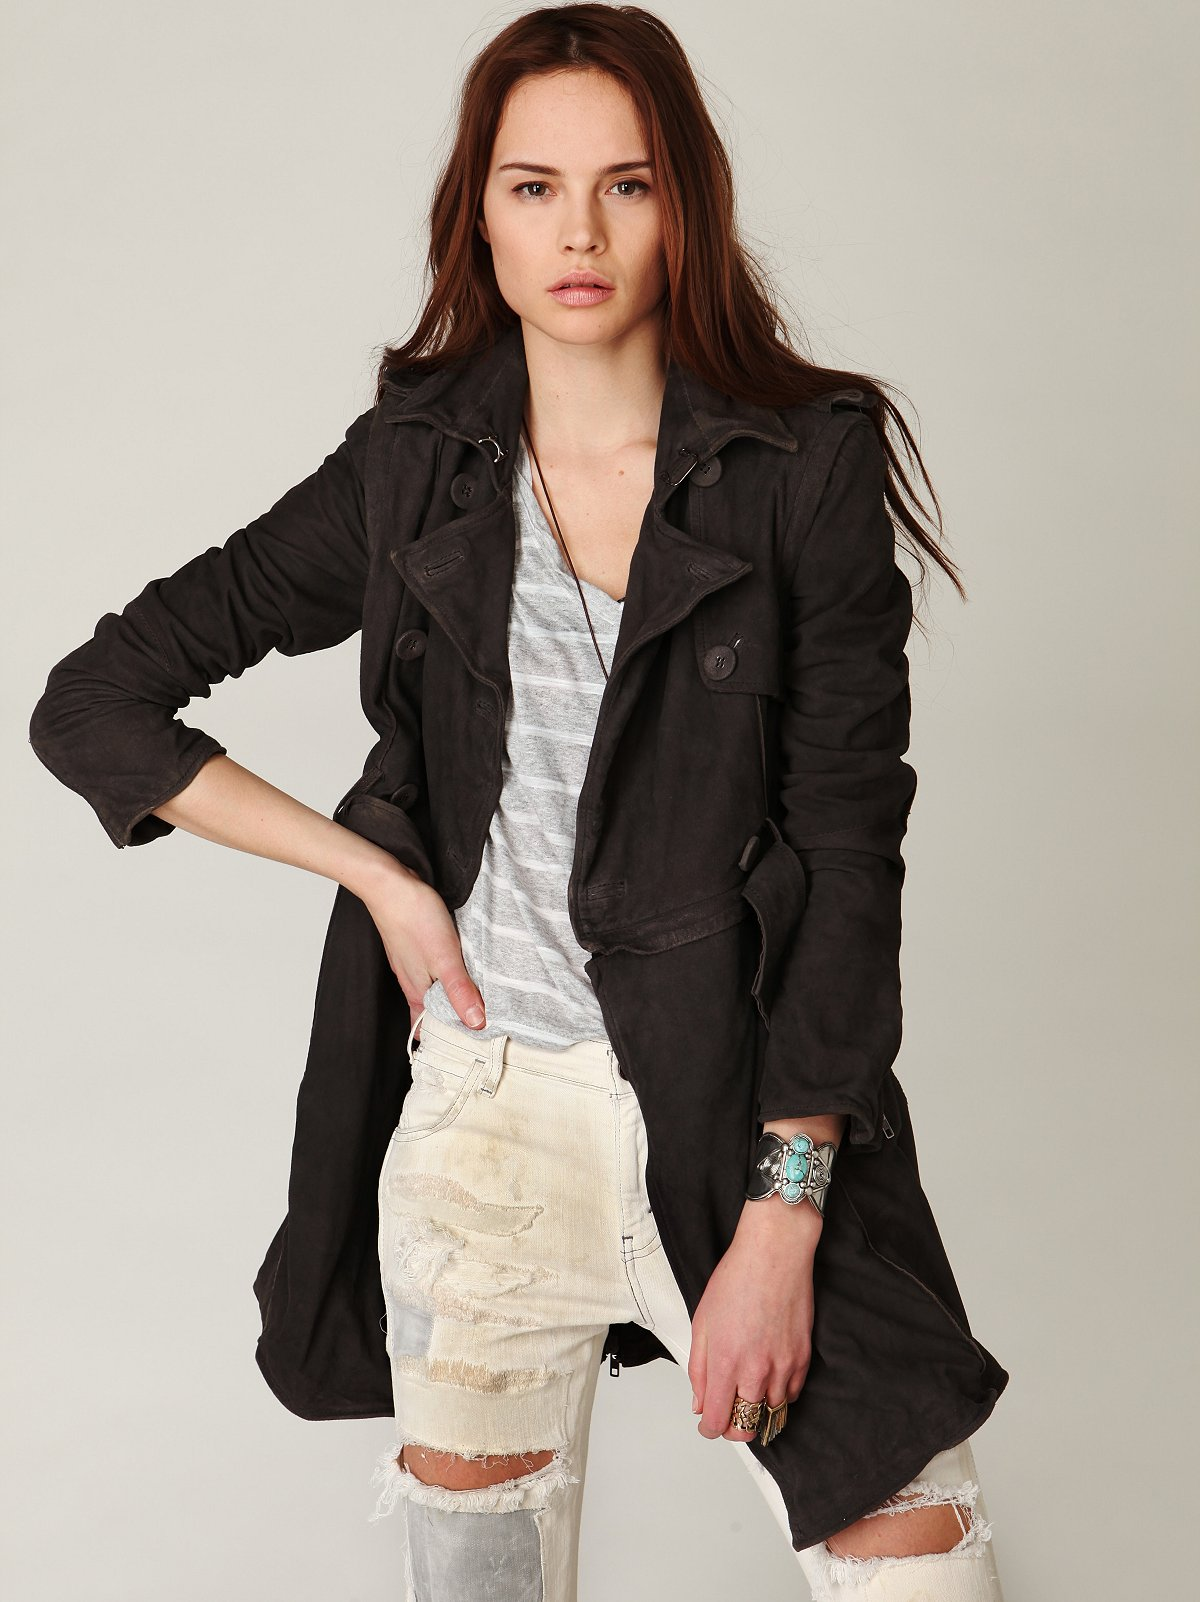 Muu Baa Convertible Leather Trench Coat